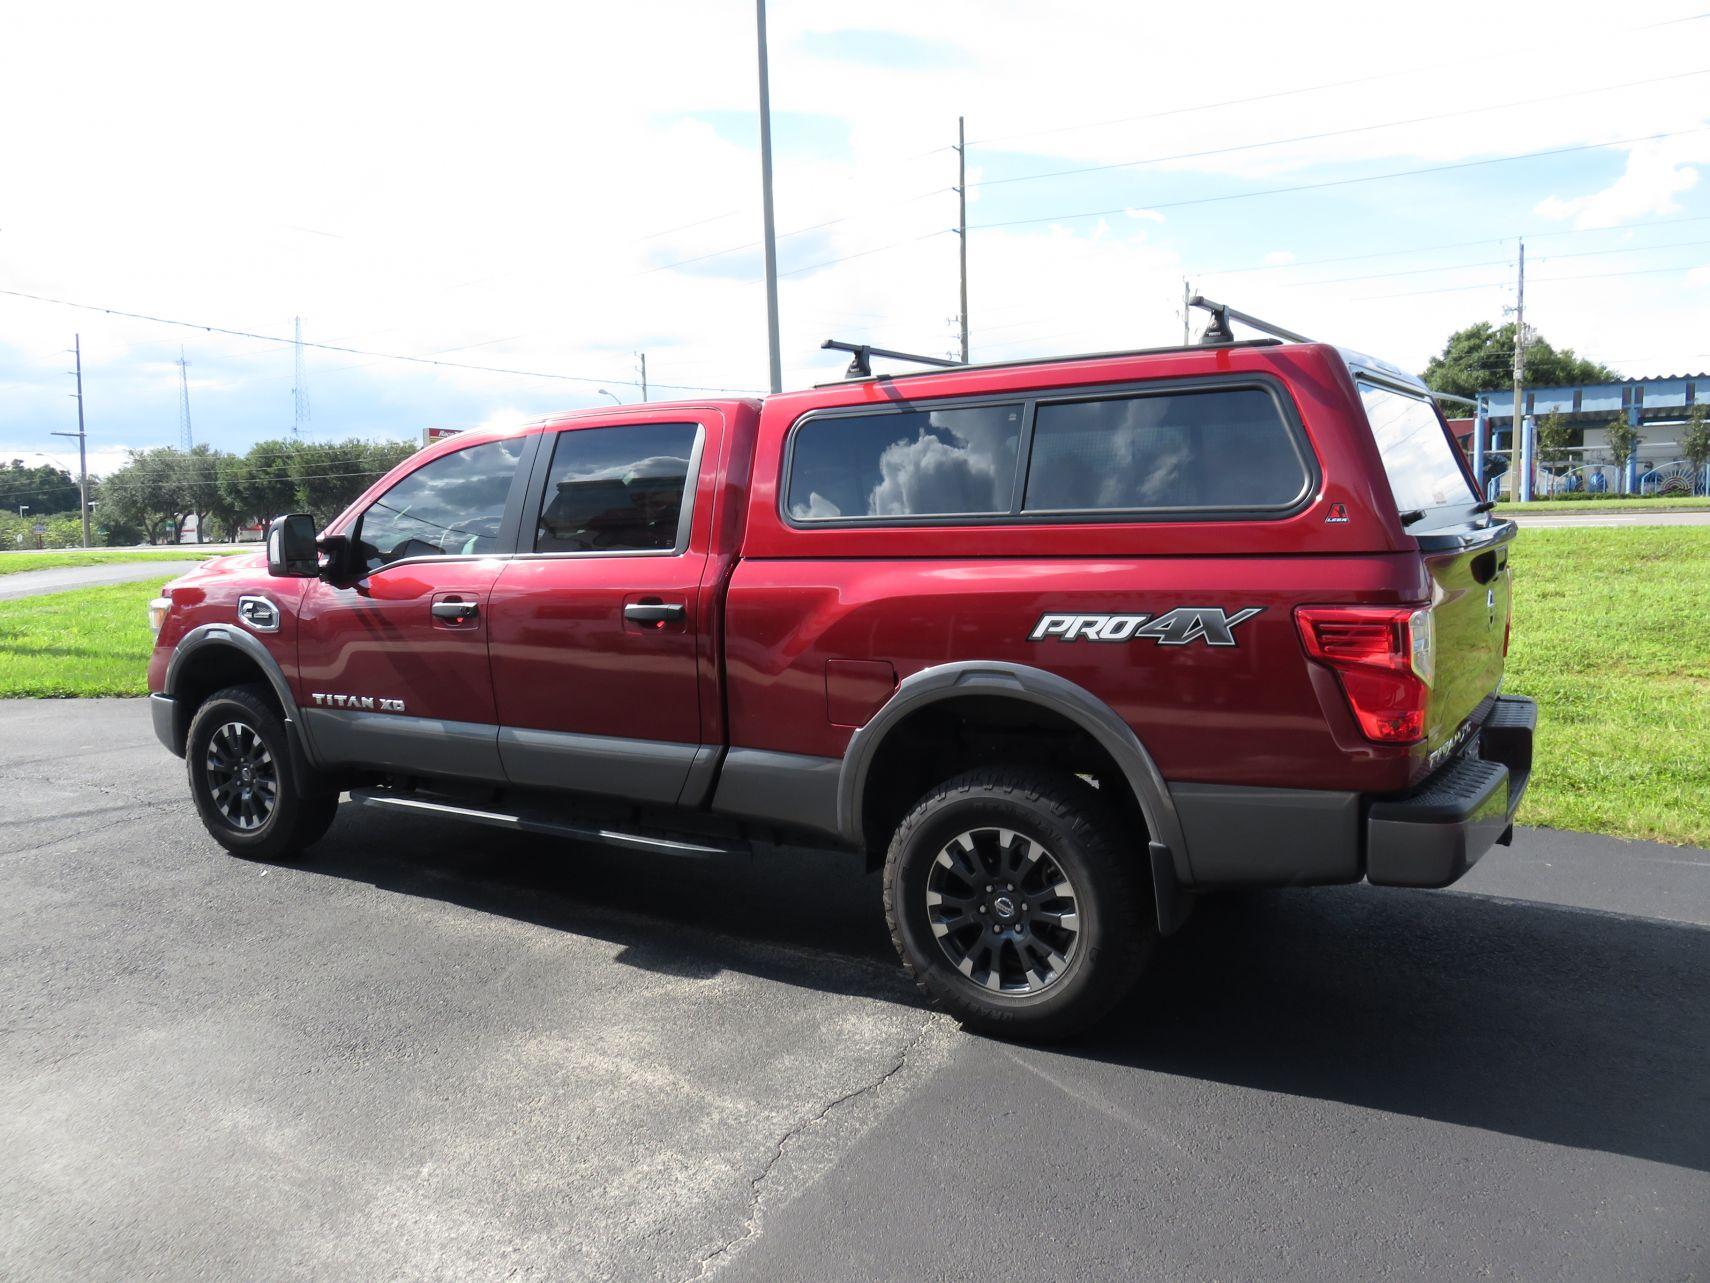 2018 Red Nissan Titan XD Leer 100R Roof Racks, Custom Hitch, Nerf Bars, Tint by TopperKING in Brandon, FL 813-689-2449 or Clearwater, FL 727-530-9066.